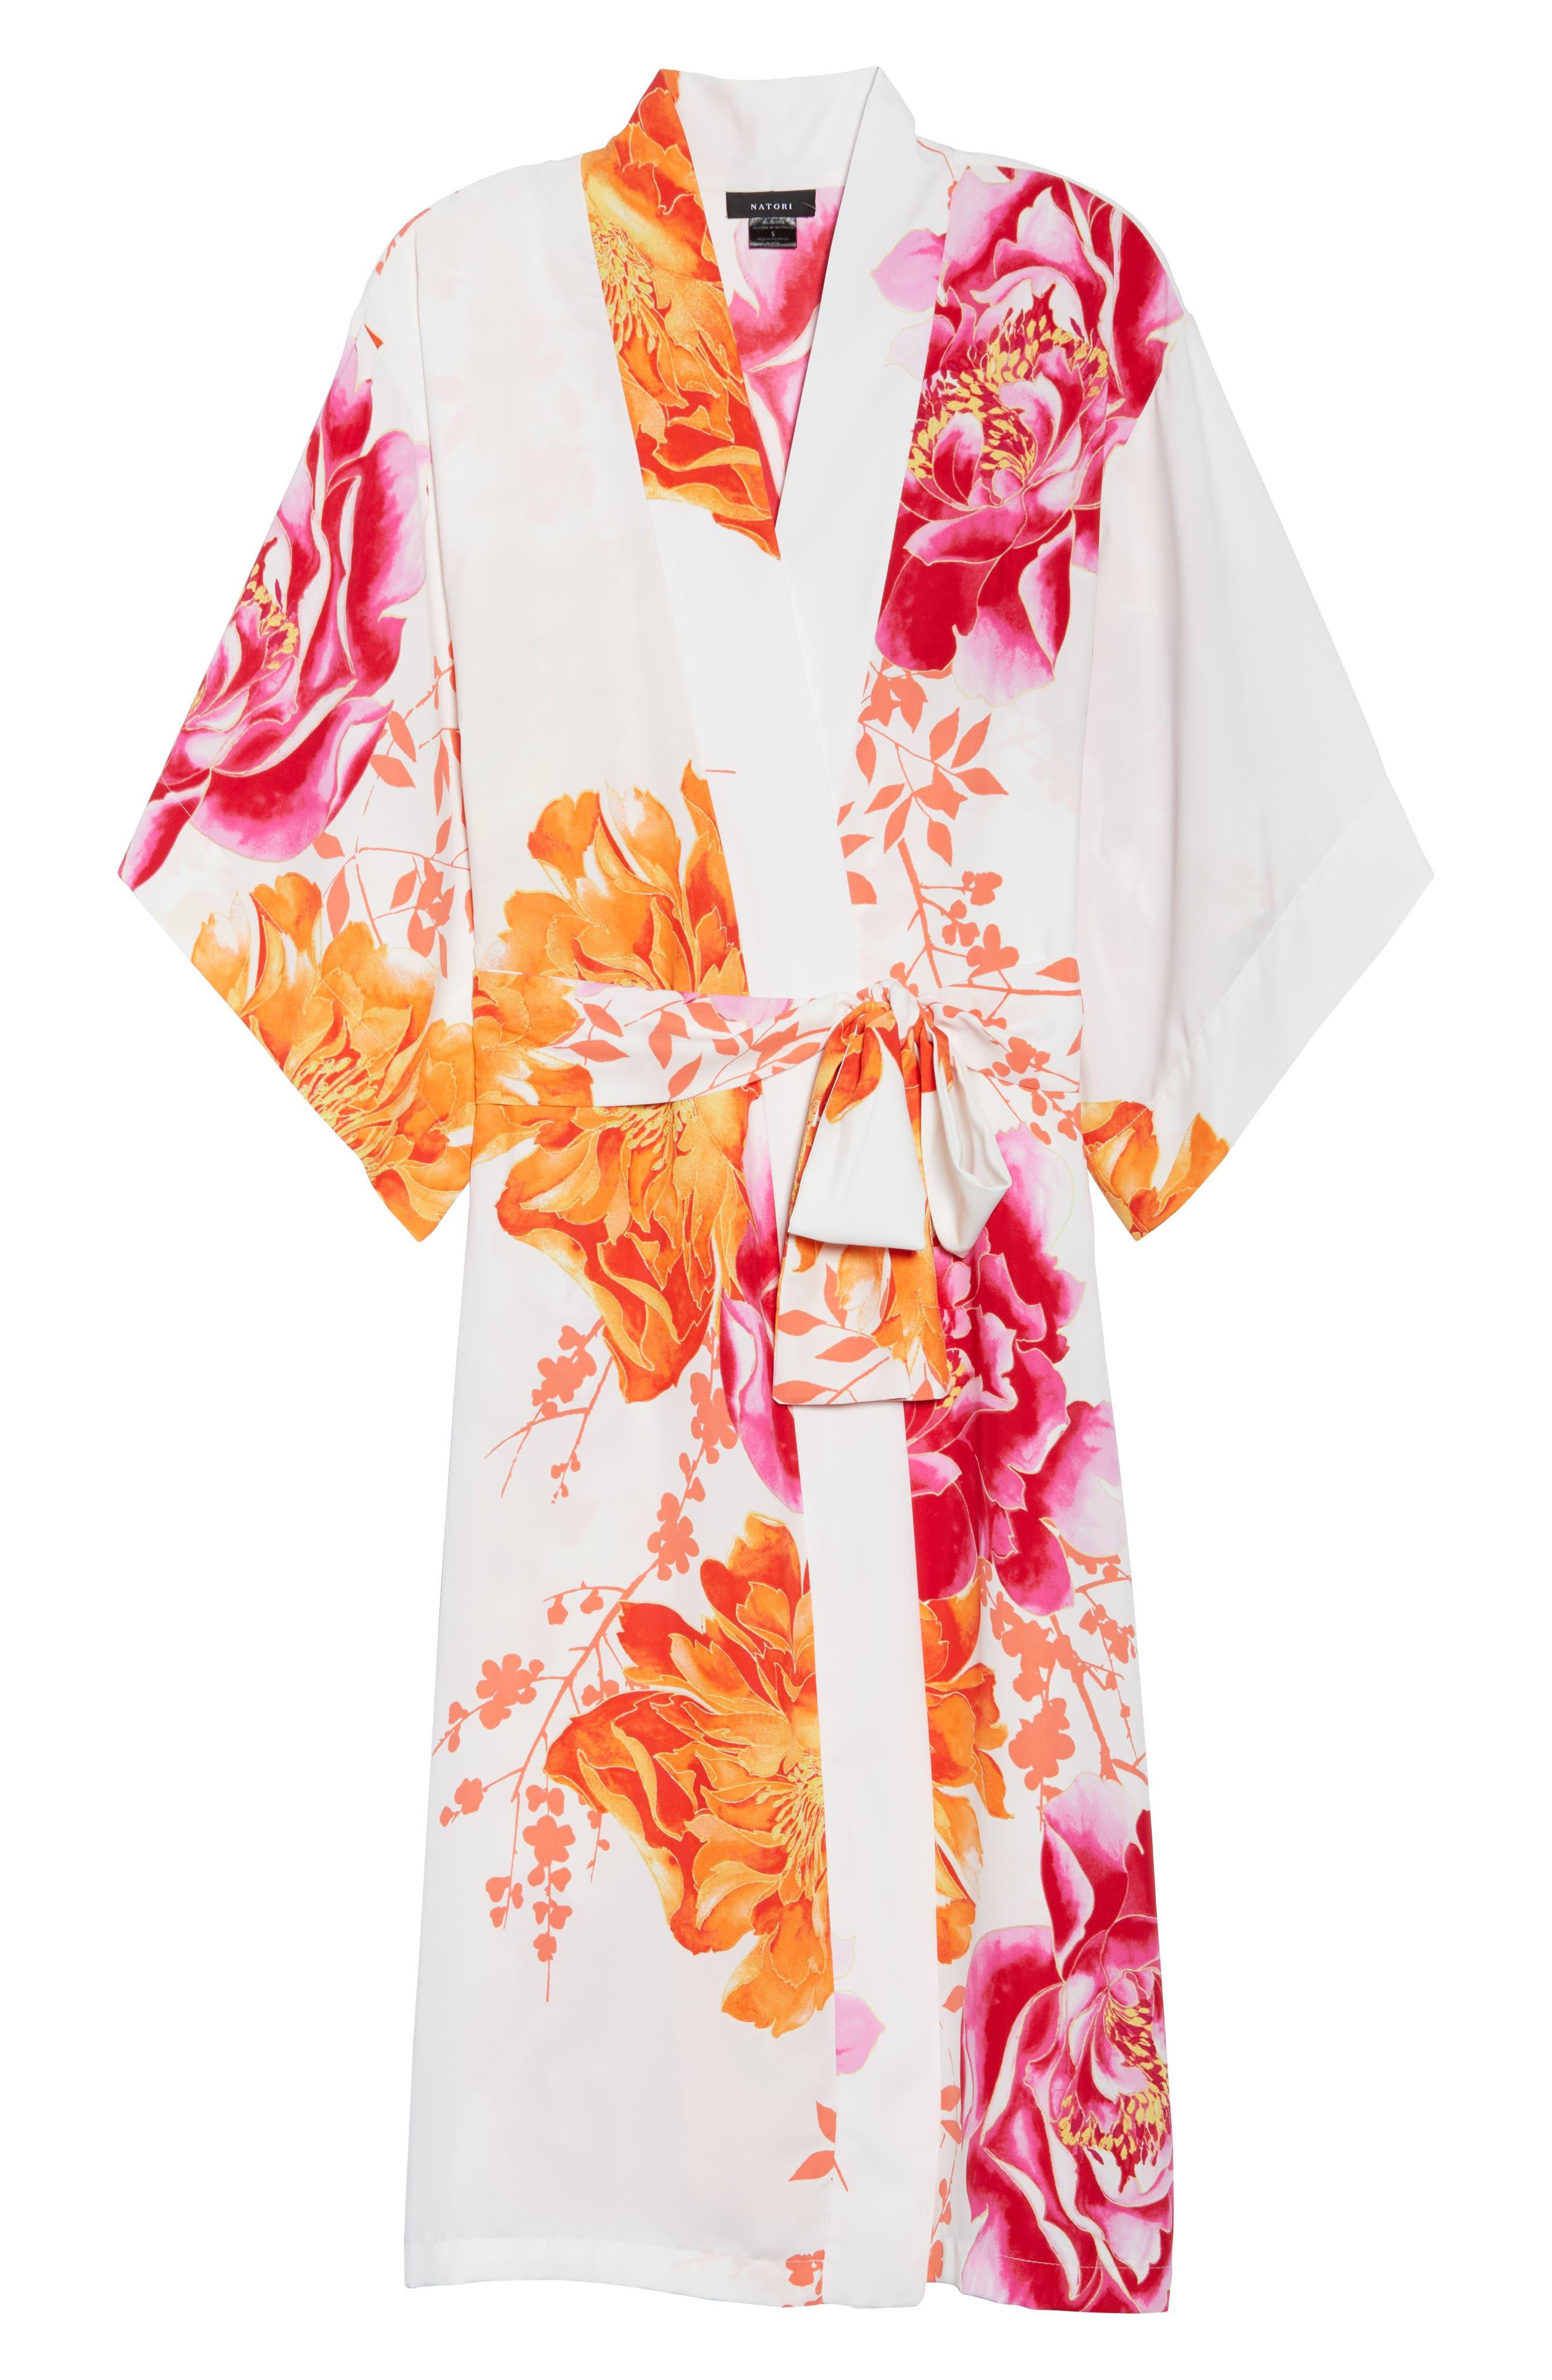 Bali Floral Print Robe,                             Alternate thumbnail 6, color,